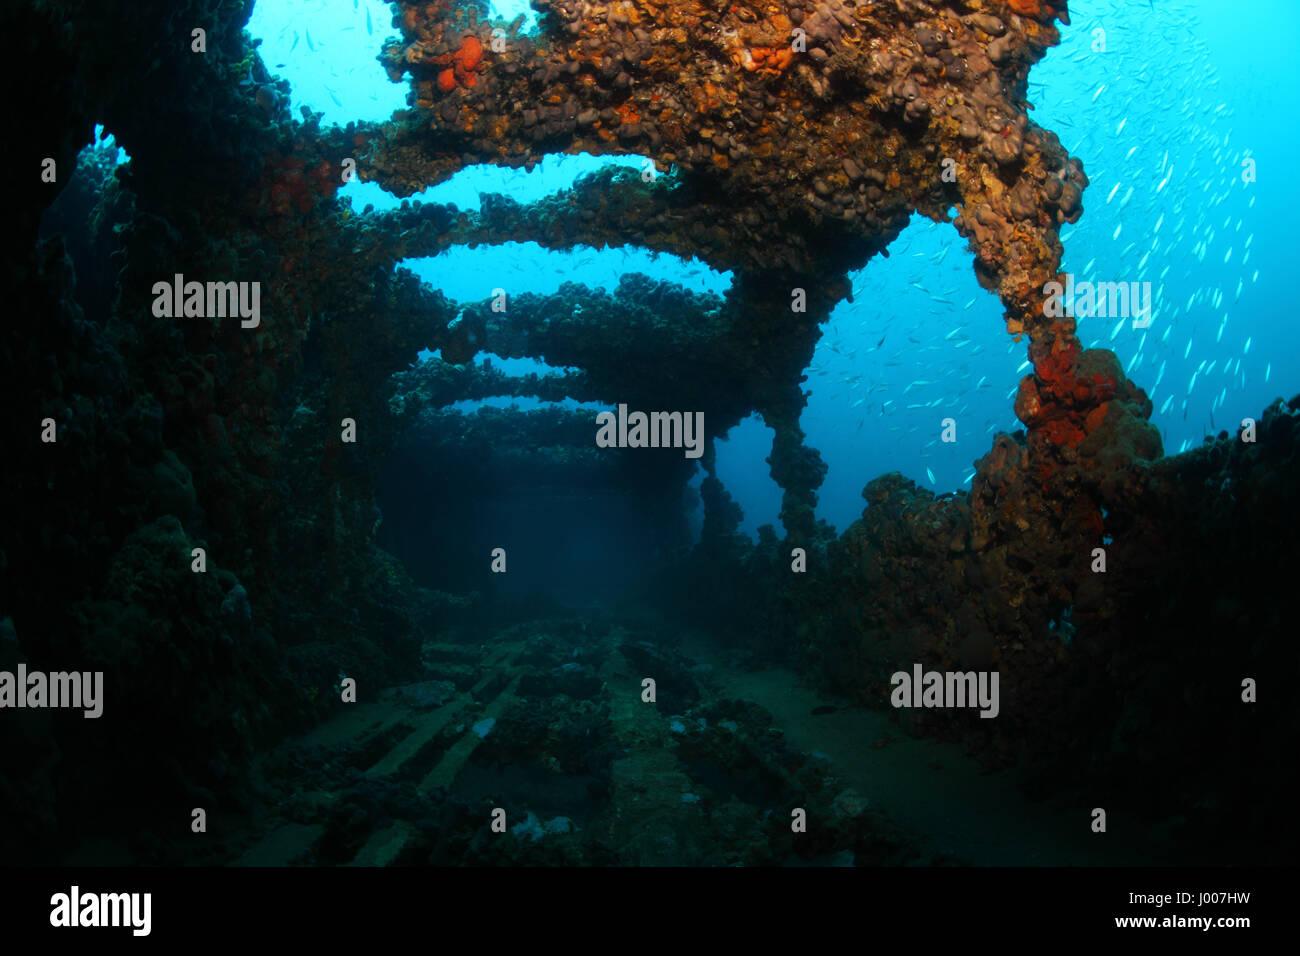 Shipwreck of the Baron Gautsch underwater in the Mediterranean Sea - Stock Image